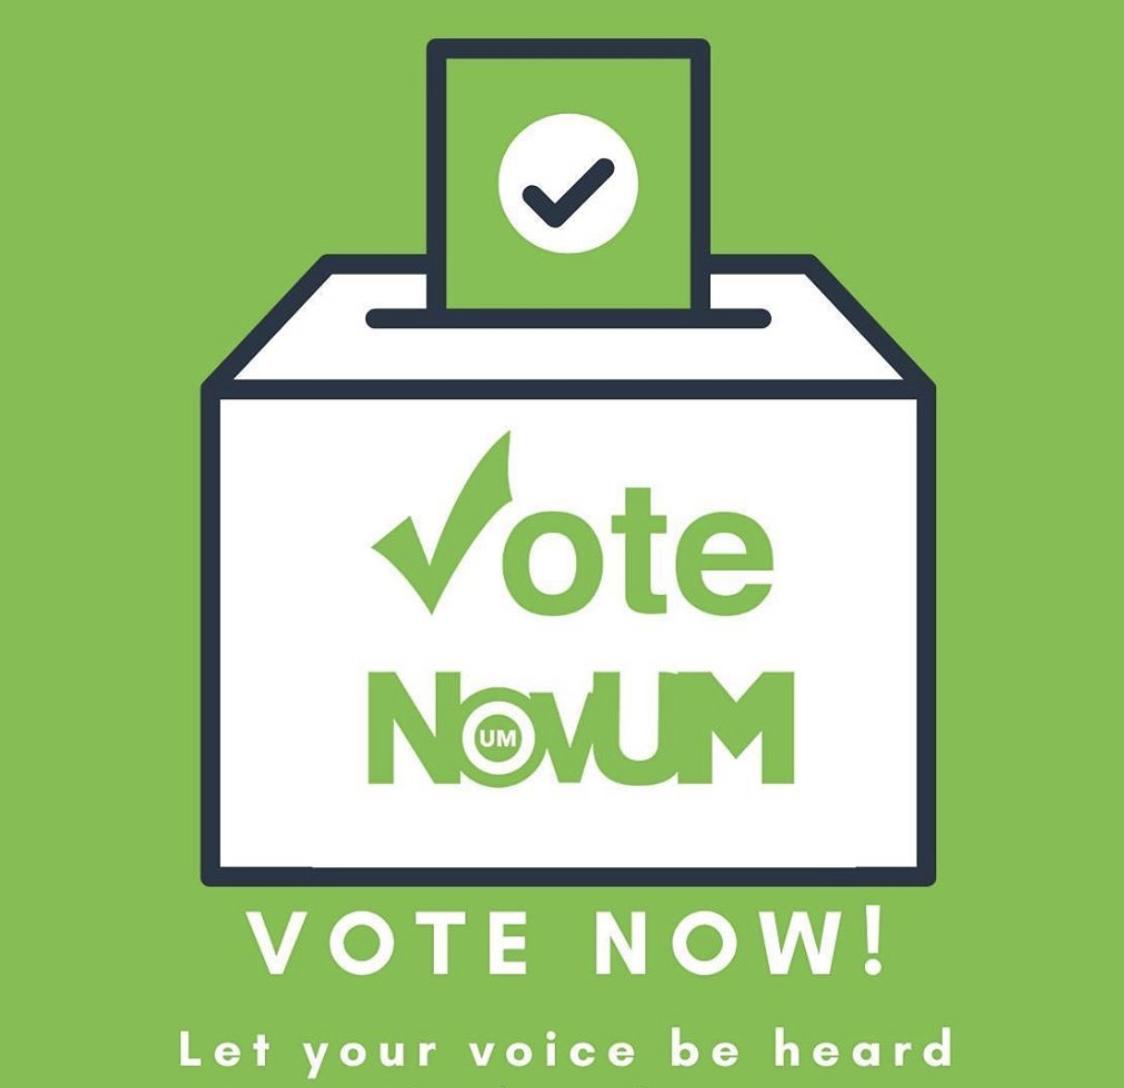 Novum campaigning